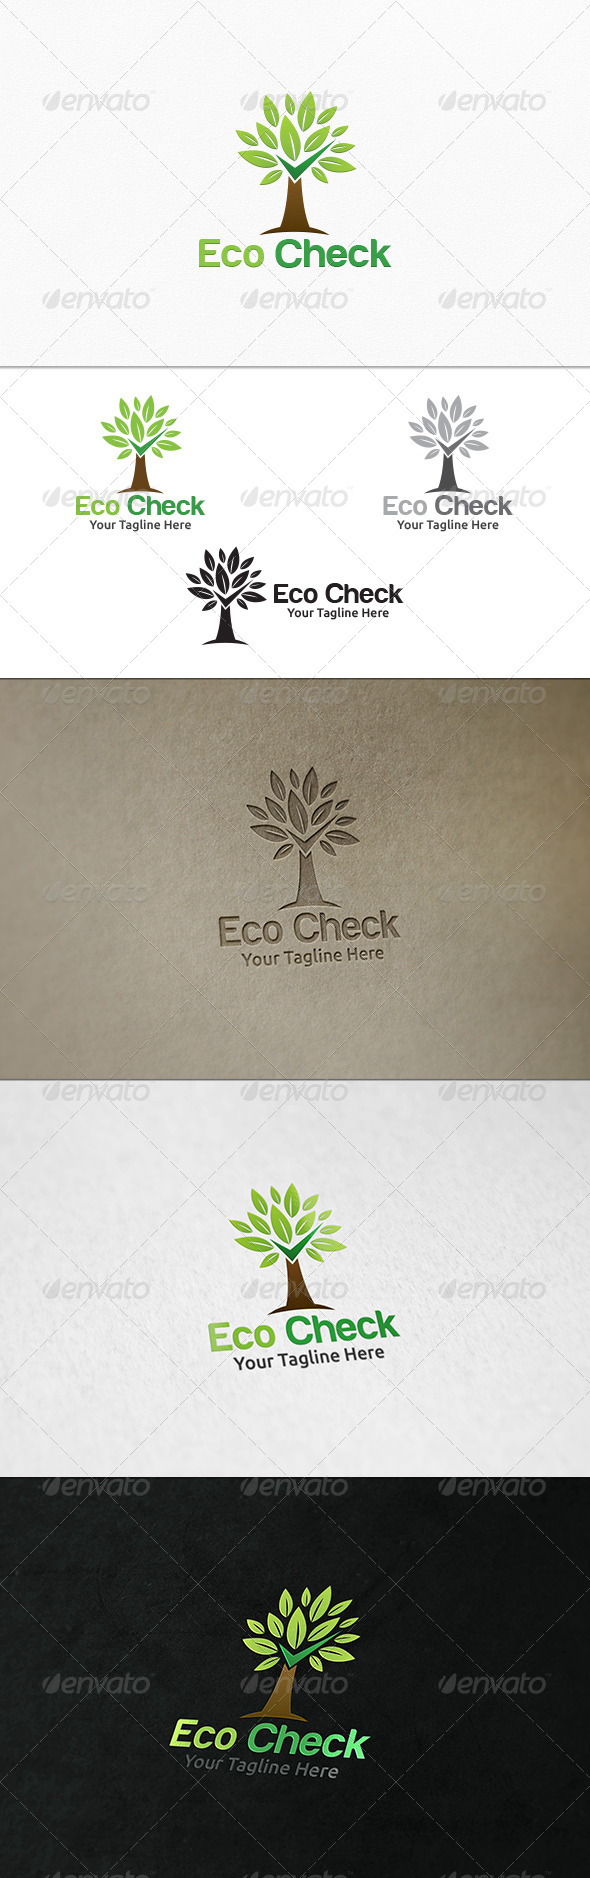 GraphicRiver Eco Check Logo Template 7724841